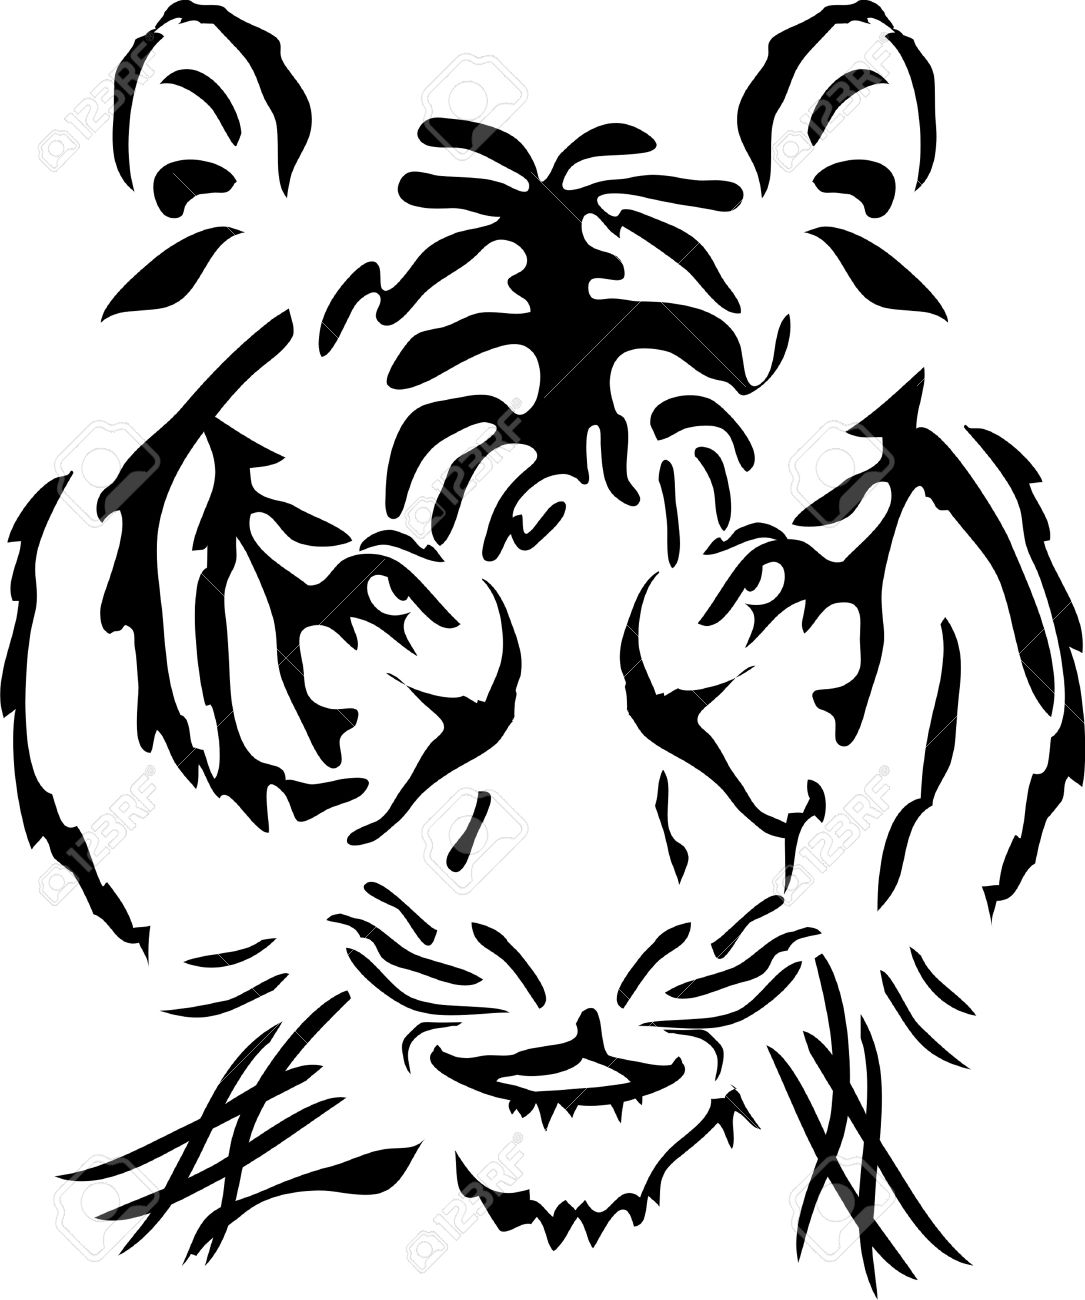 Tigre Bengala clipart #5, Download drawings